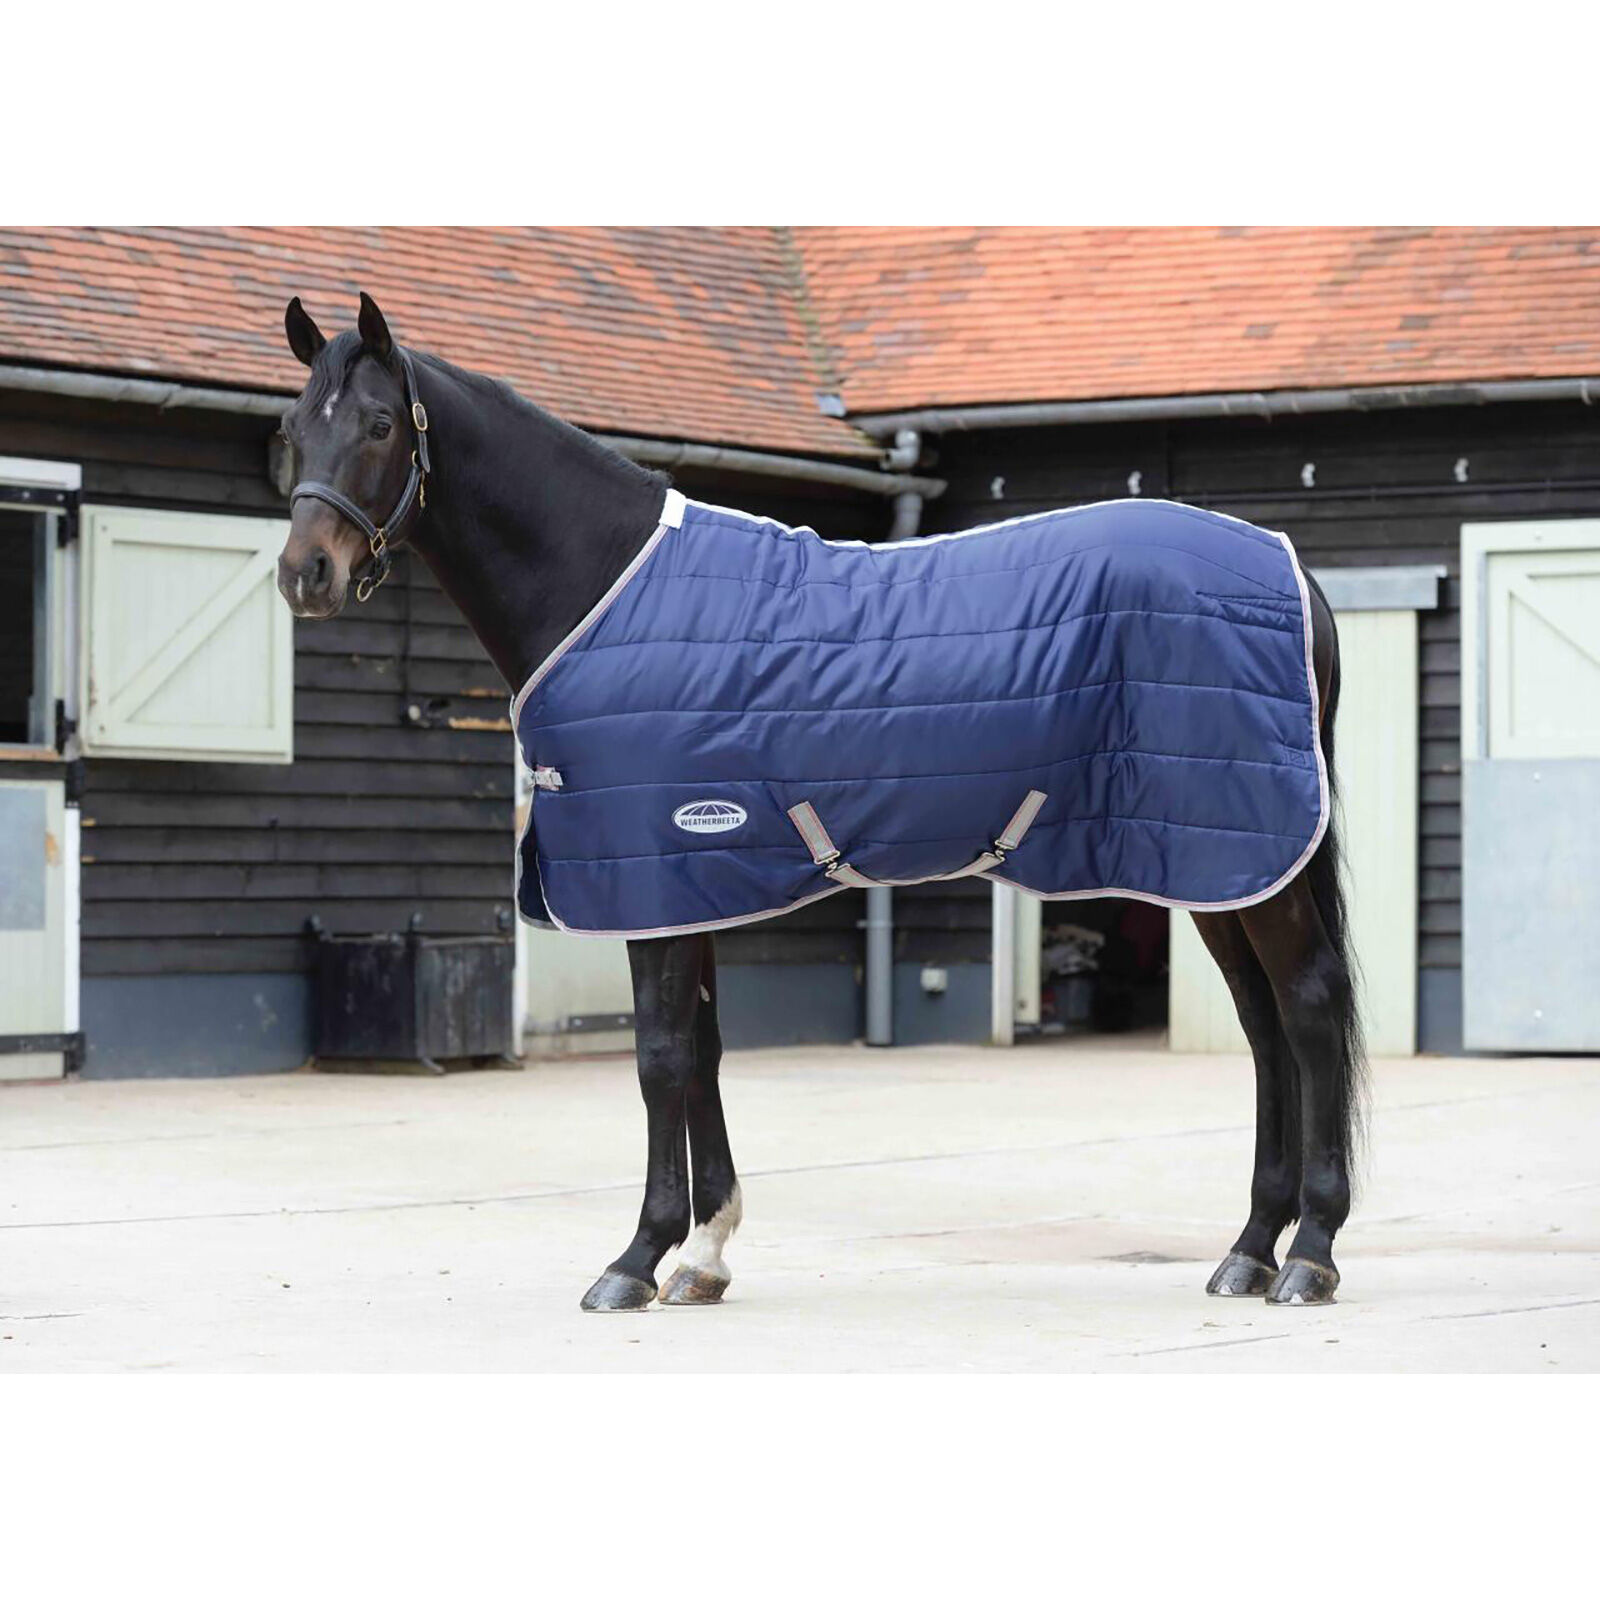 NETPROSHOP Horse Stable Rug Hanger with 3 Swivelling Arms Black